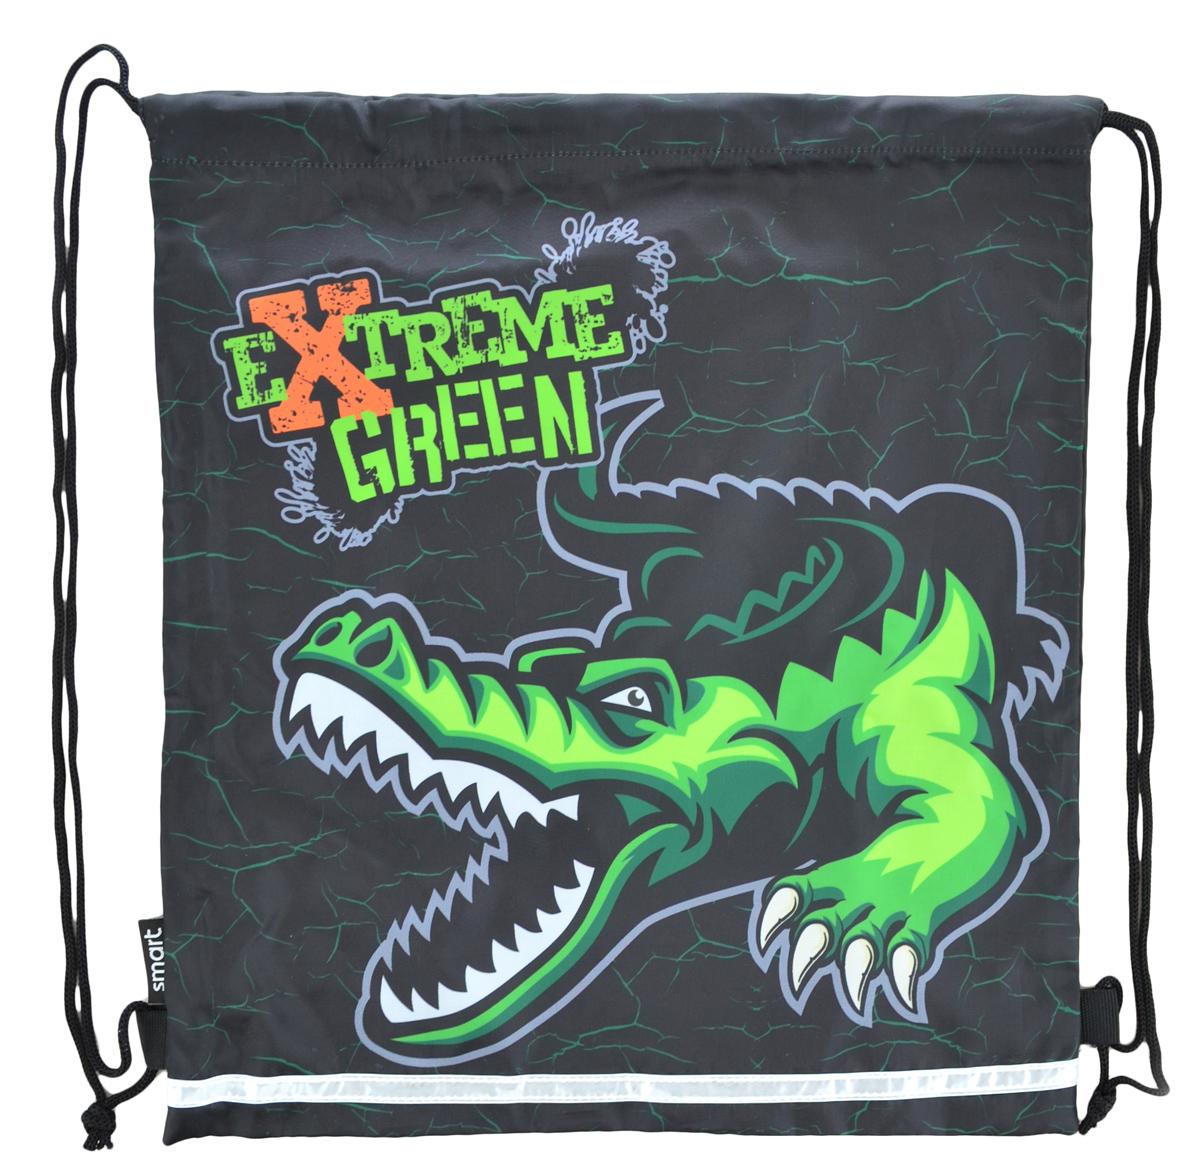 Сумка для обуви SB-01 Extreme green, 40*35